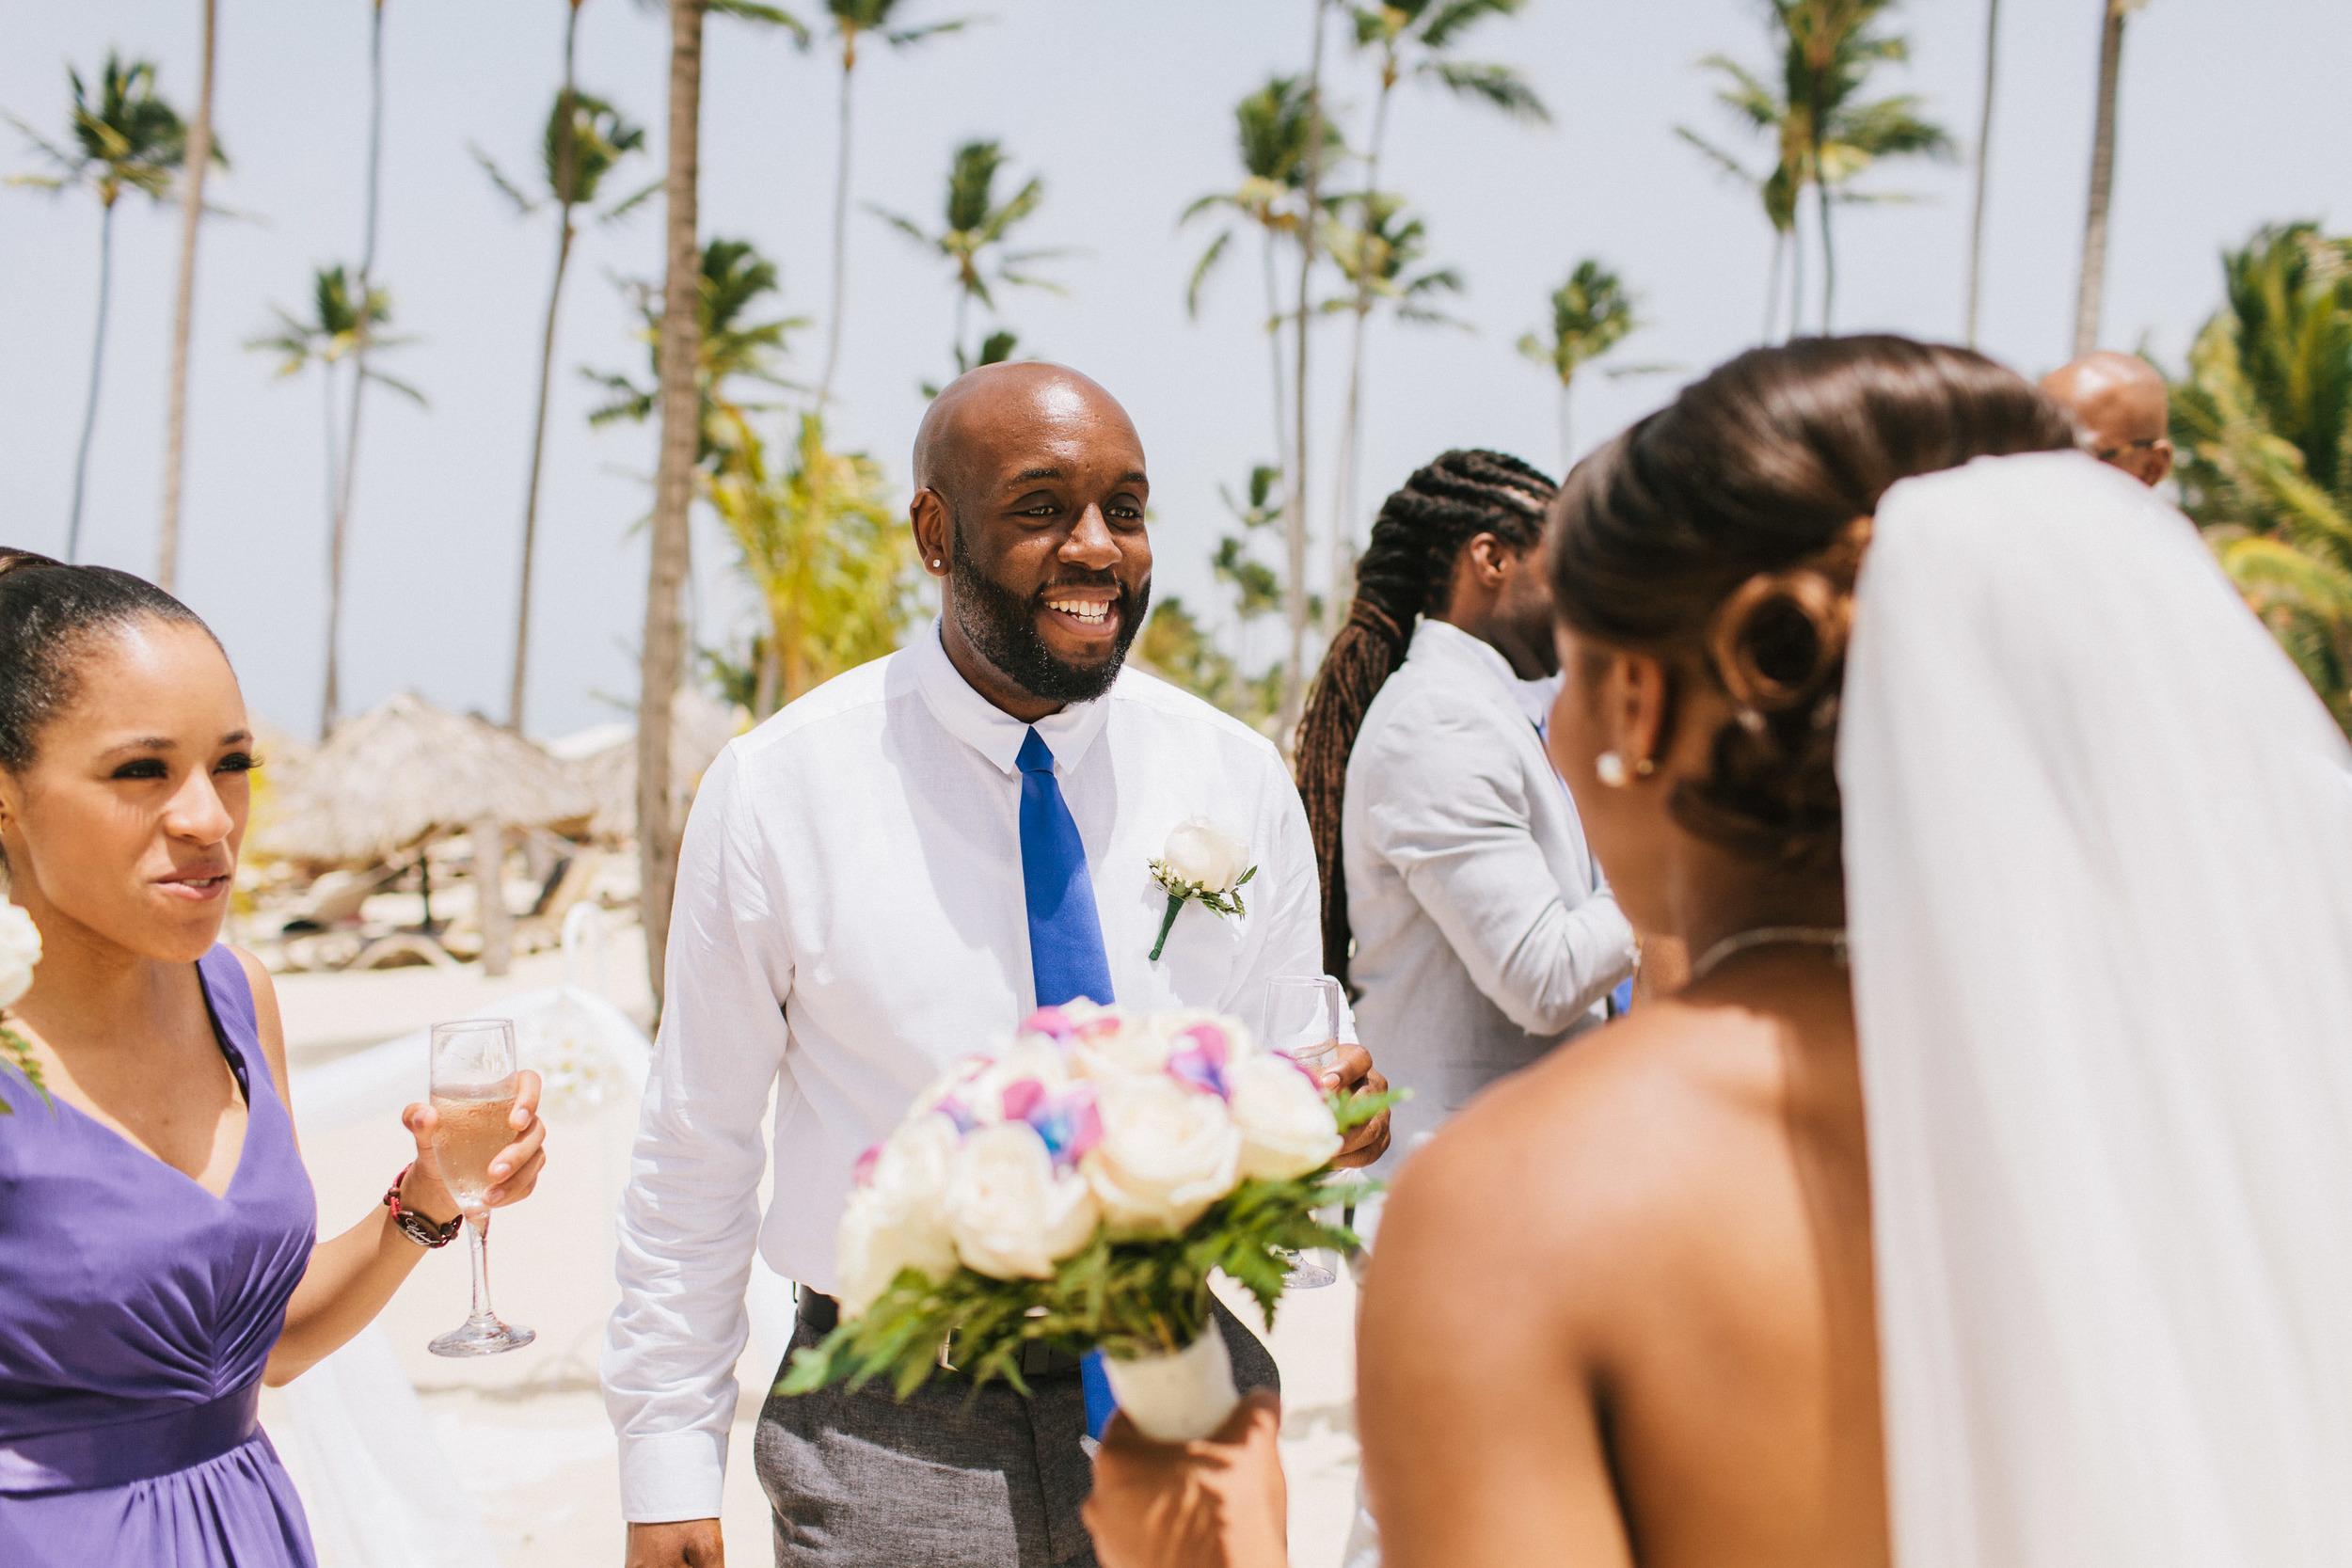 michael-rousseau-photography-dominican-republic-destination-wedding-cara-jason-colonial-majestic-dominican-republic083.jpg